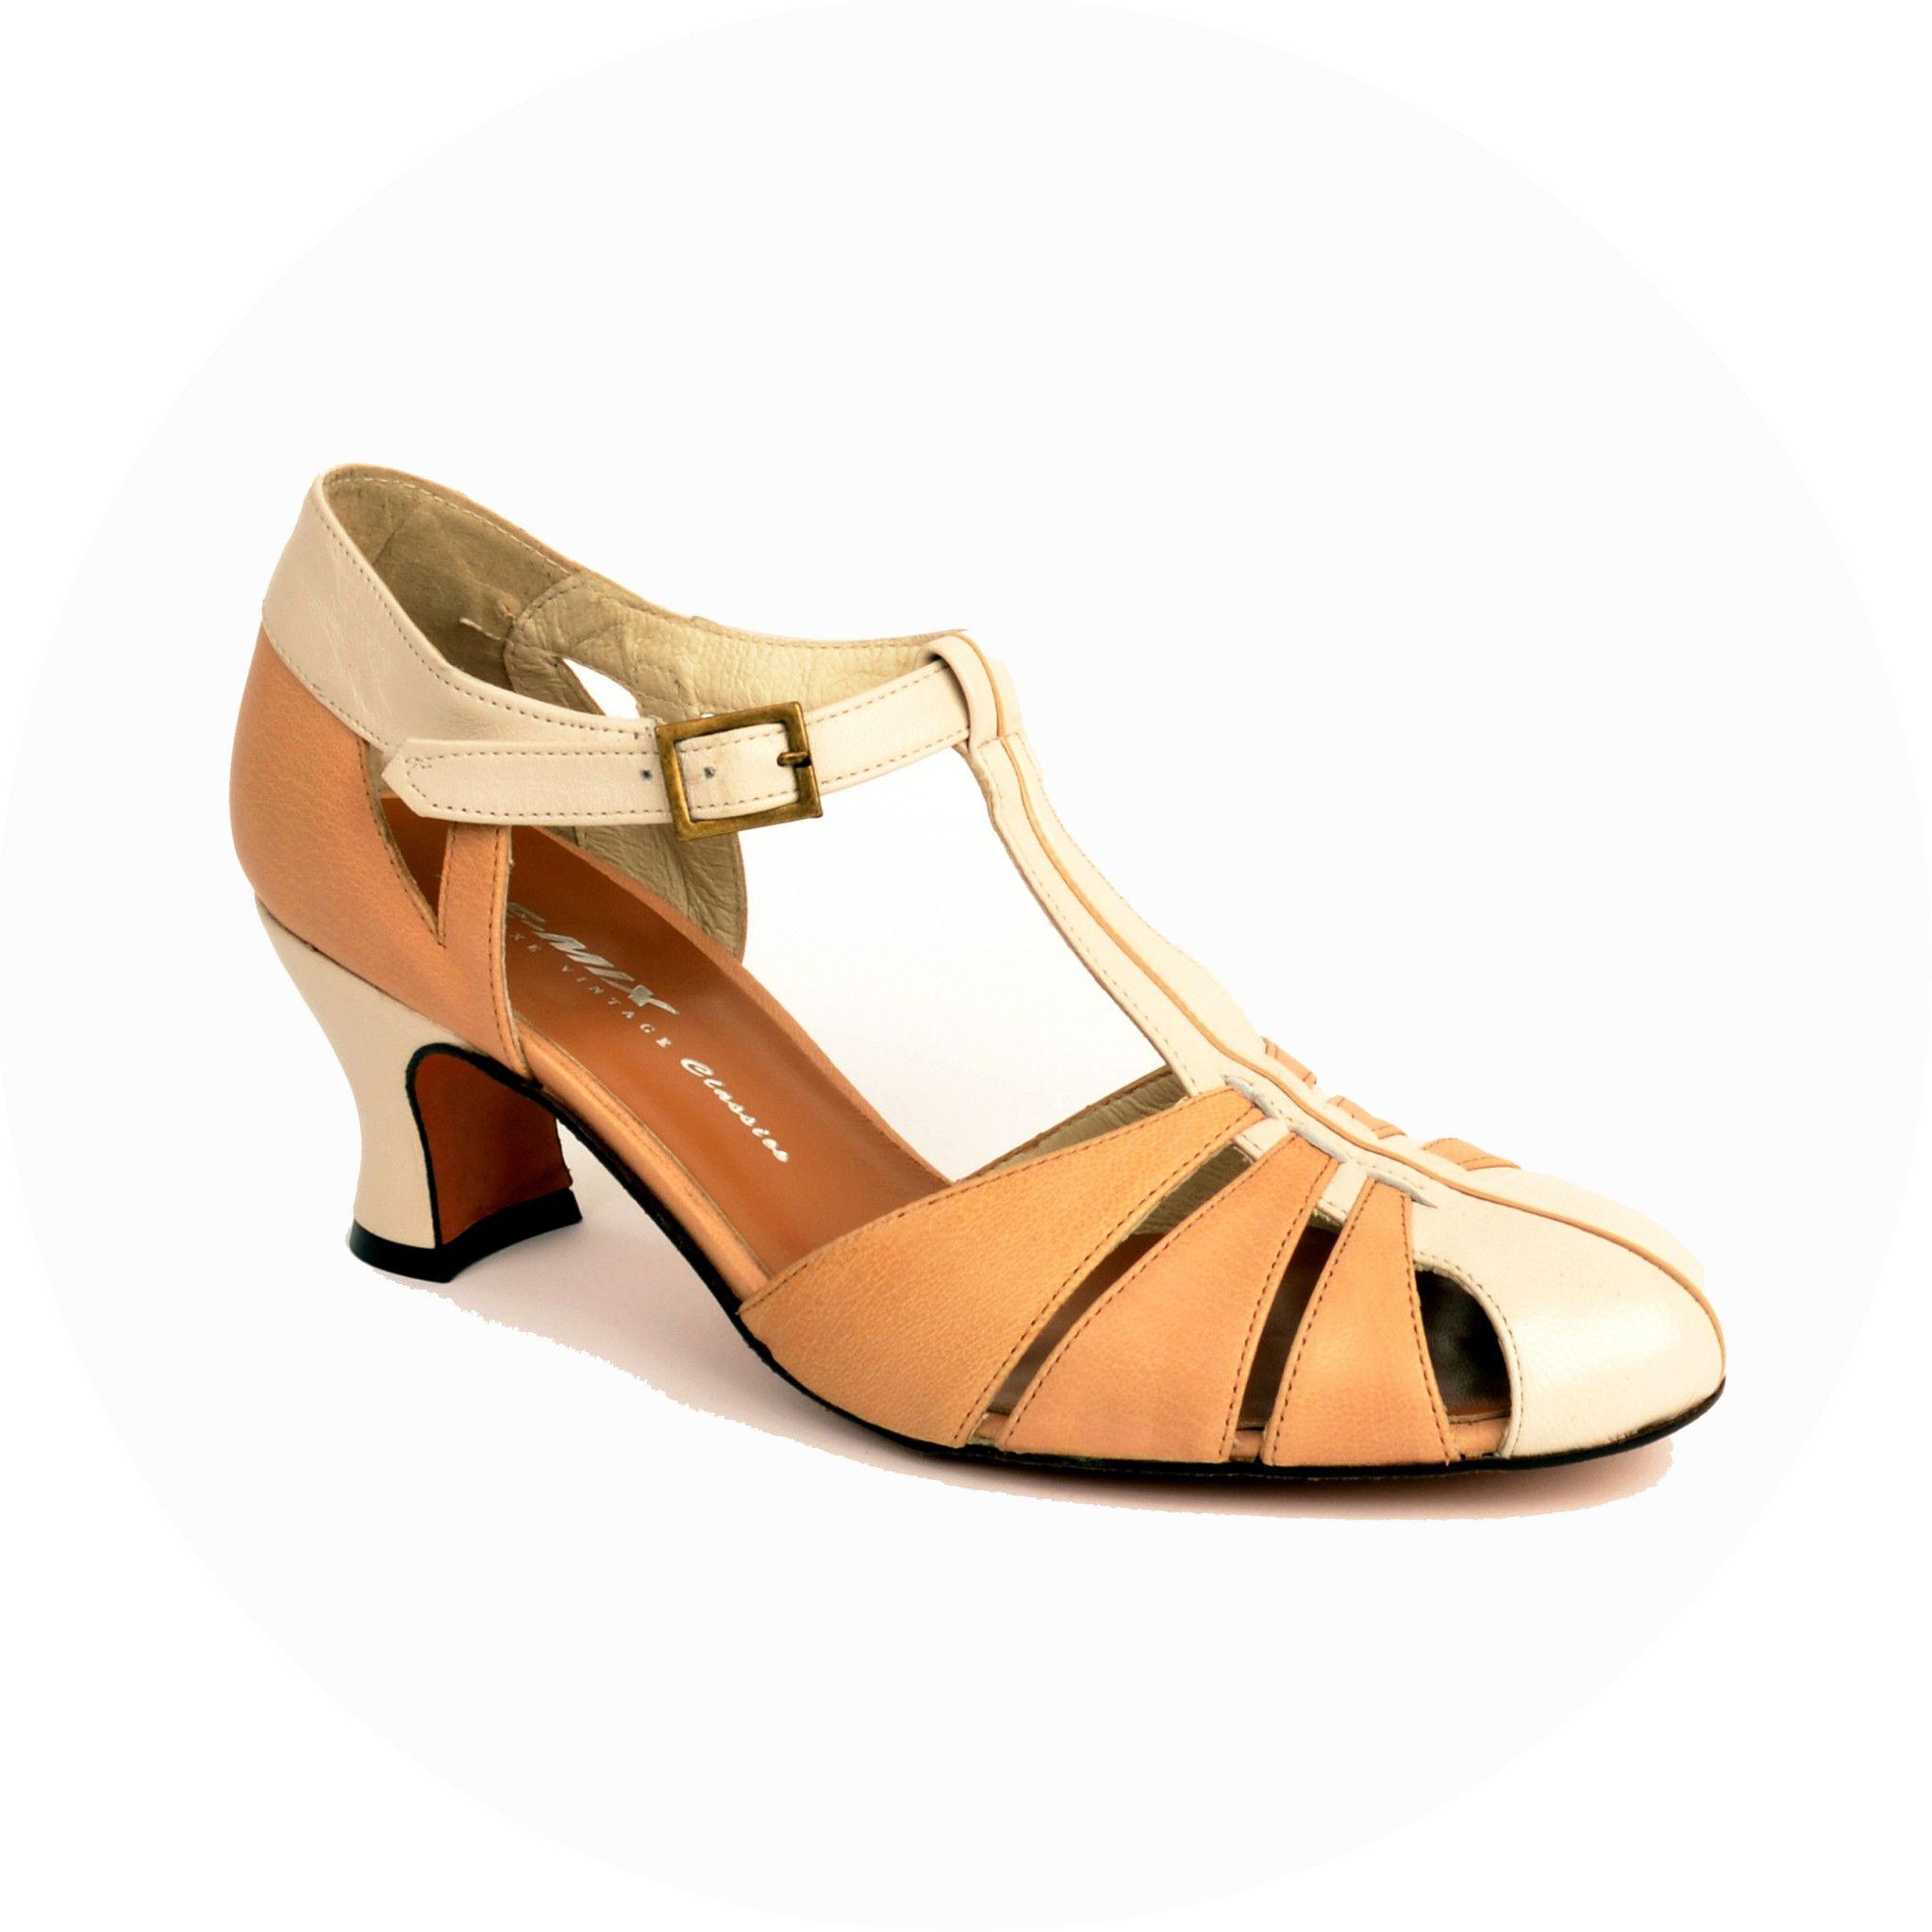 ac6e12dd5d4bb7 ReMix Vintage Shoes Balboa